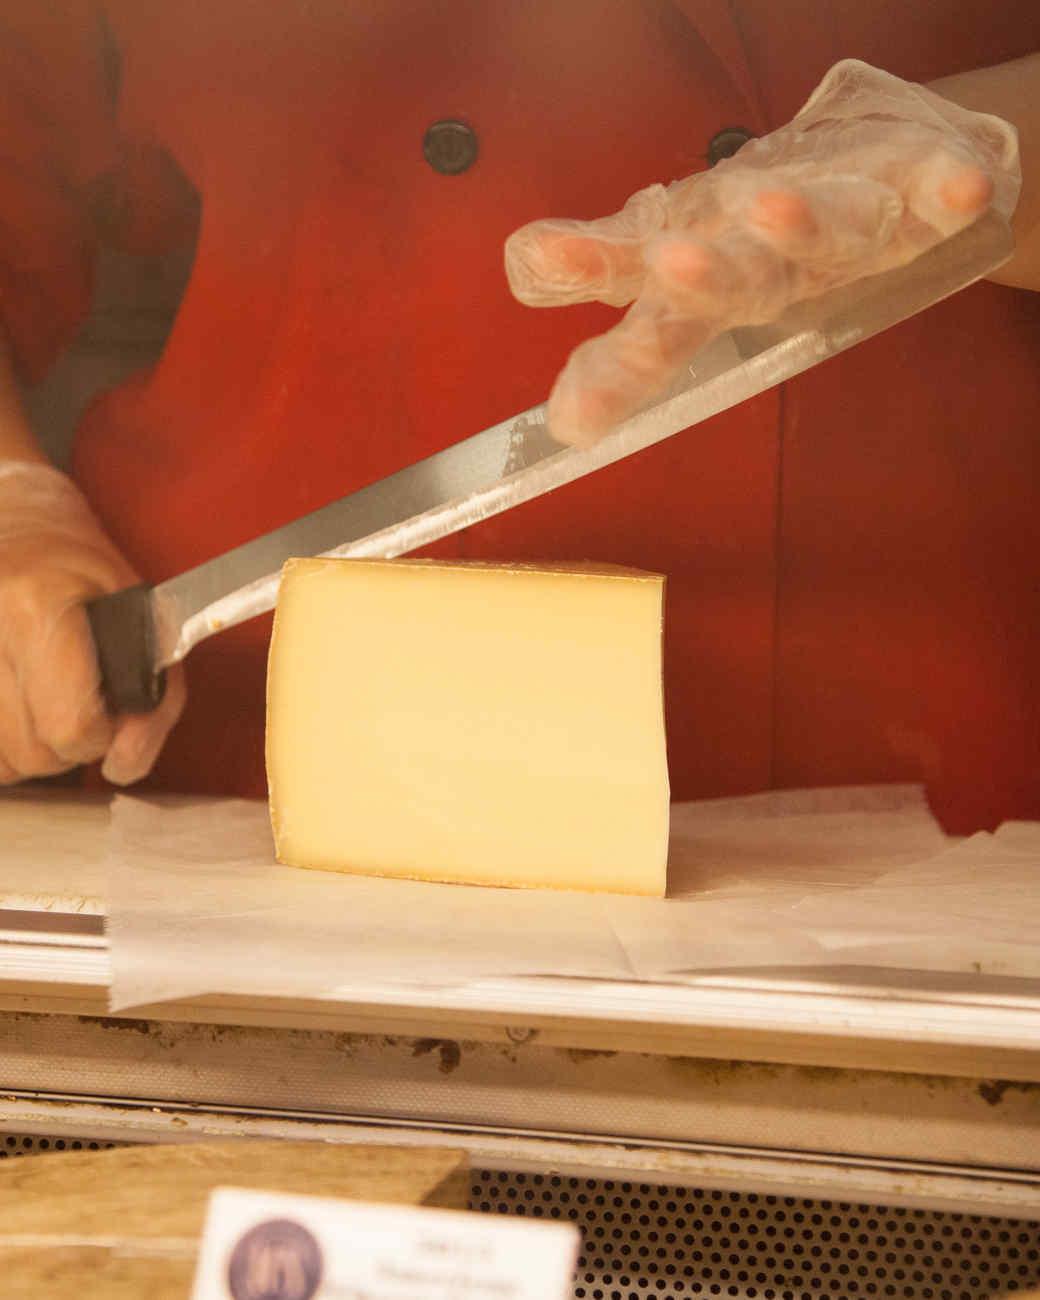 kevin-sharkey-murrays-cheese-081-d110550.jpg